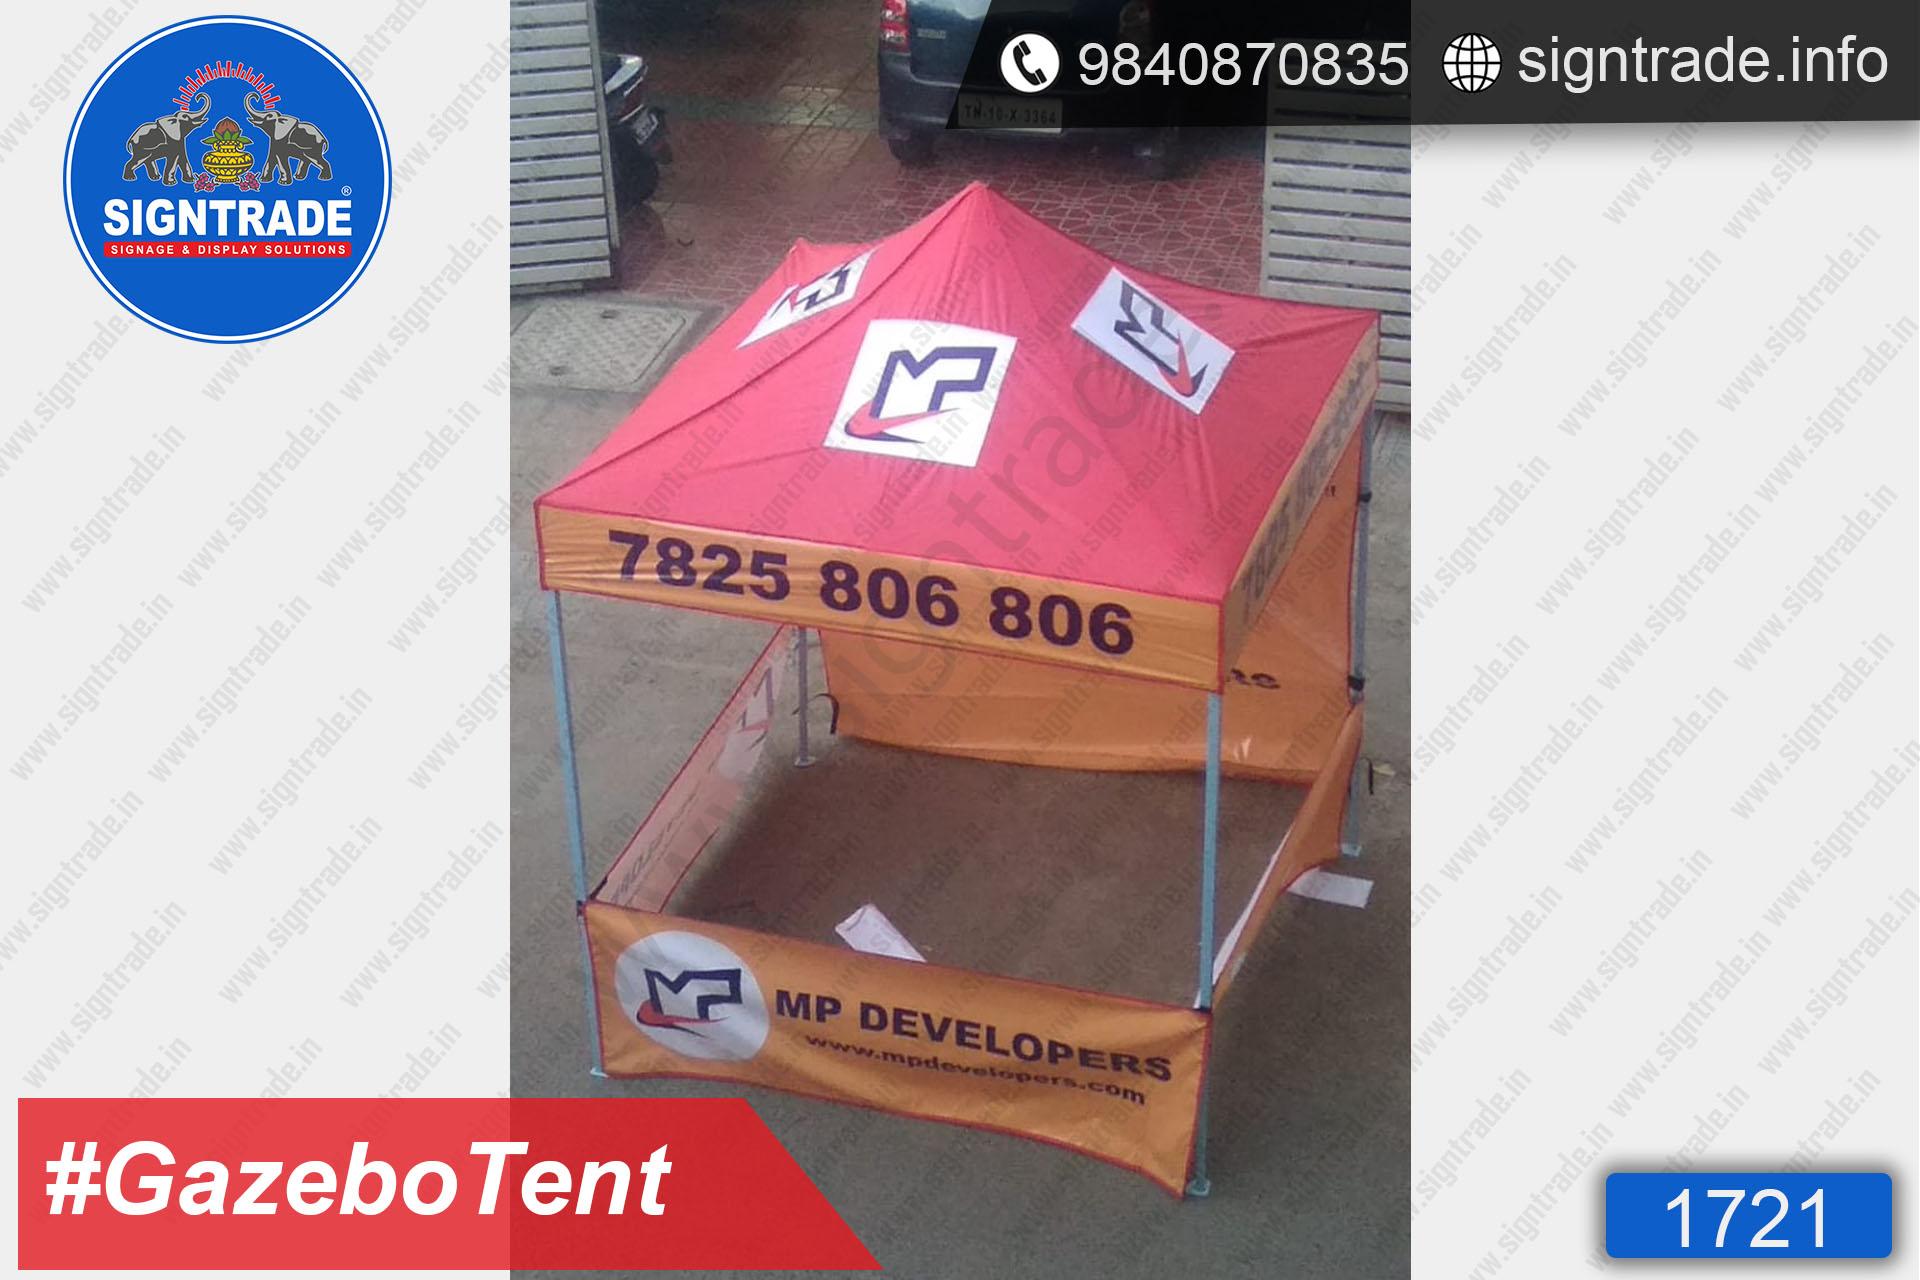 MP Developers - Gazebo Tent - SIGNTRADE - Promotional Gazebo Tent Manufacturers in Chennai